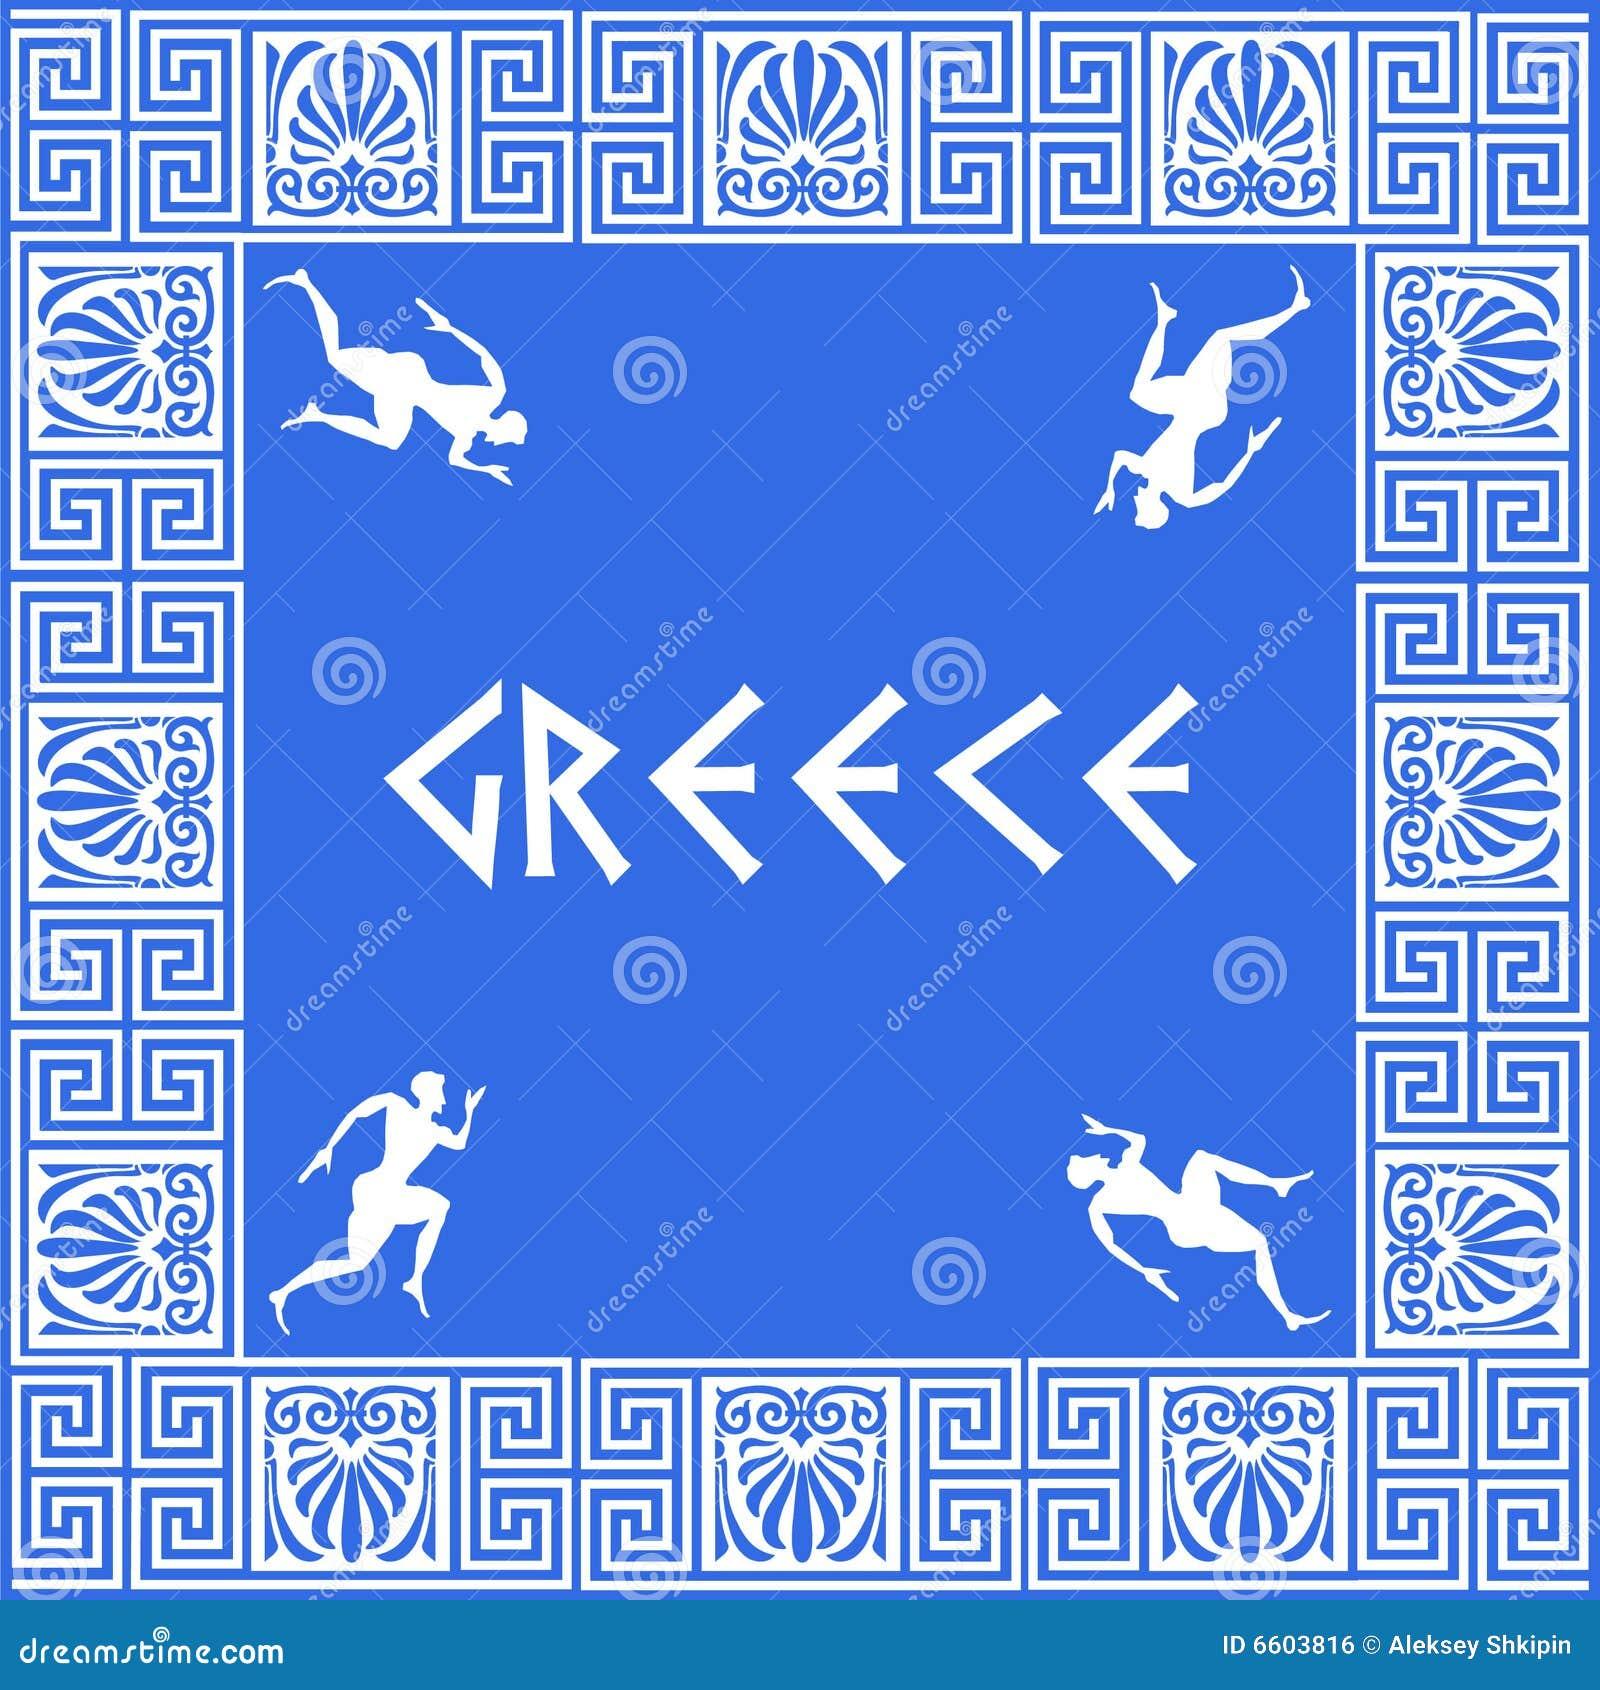 Greek Pattern Background Royalty Free Stock Image - Image: 6603816